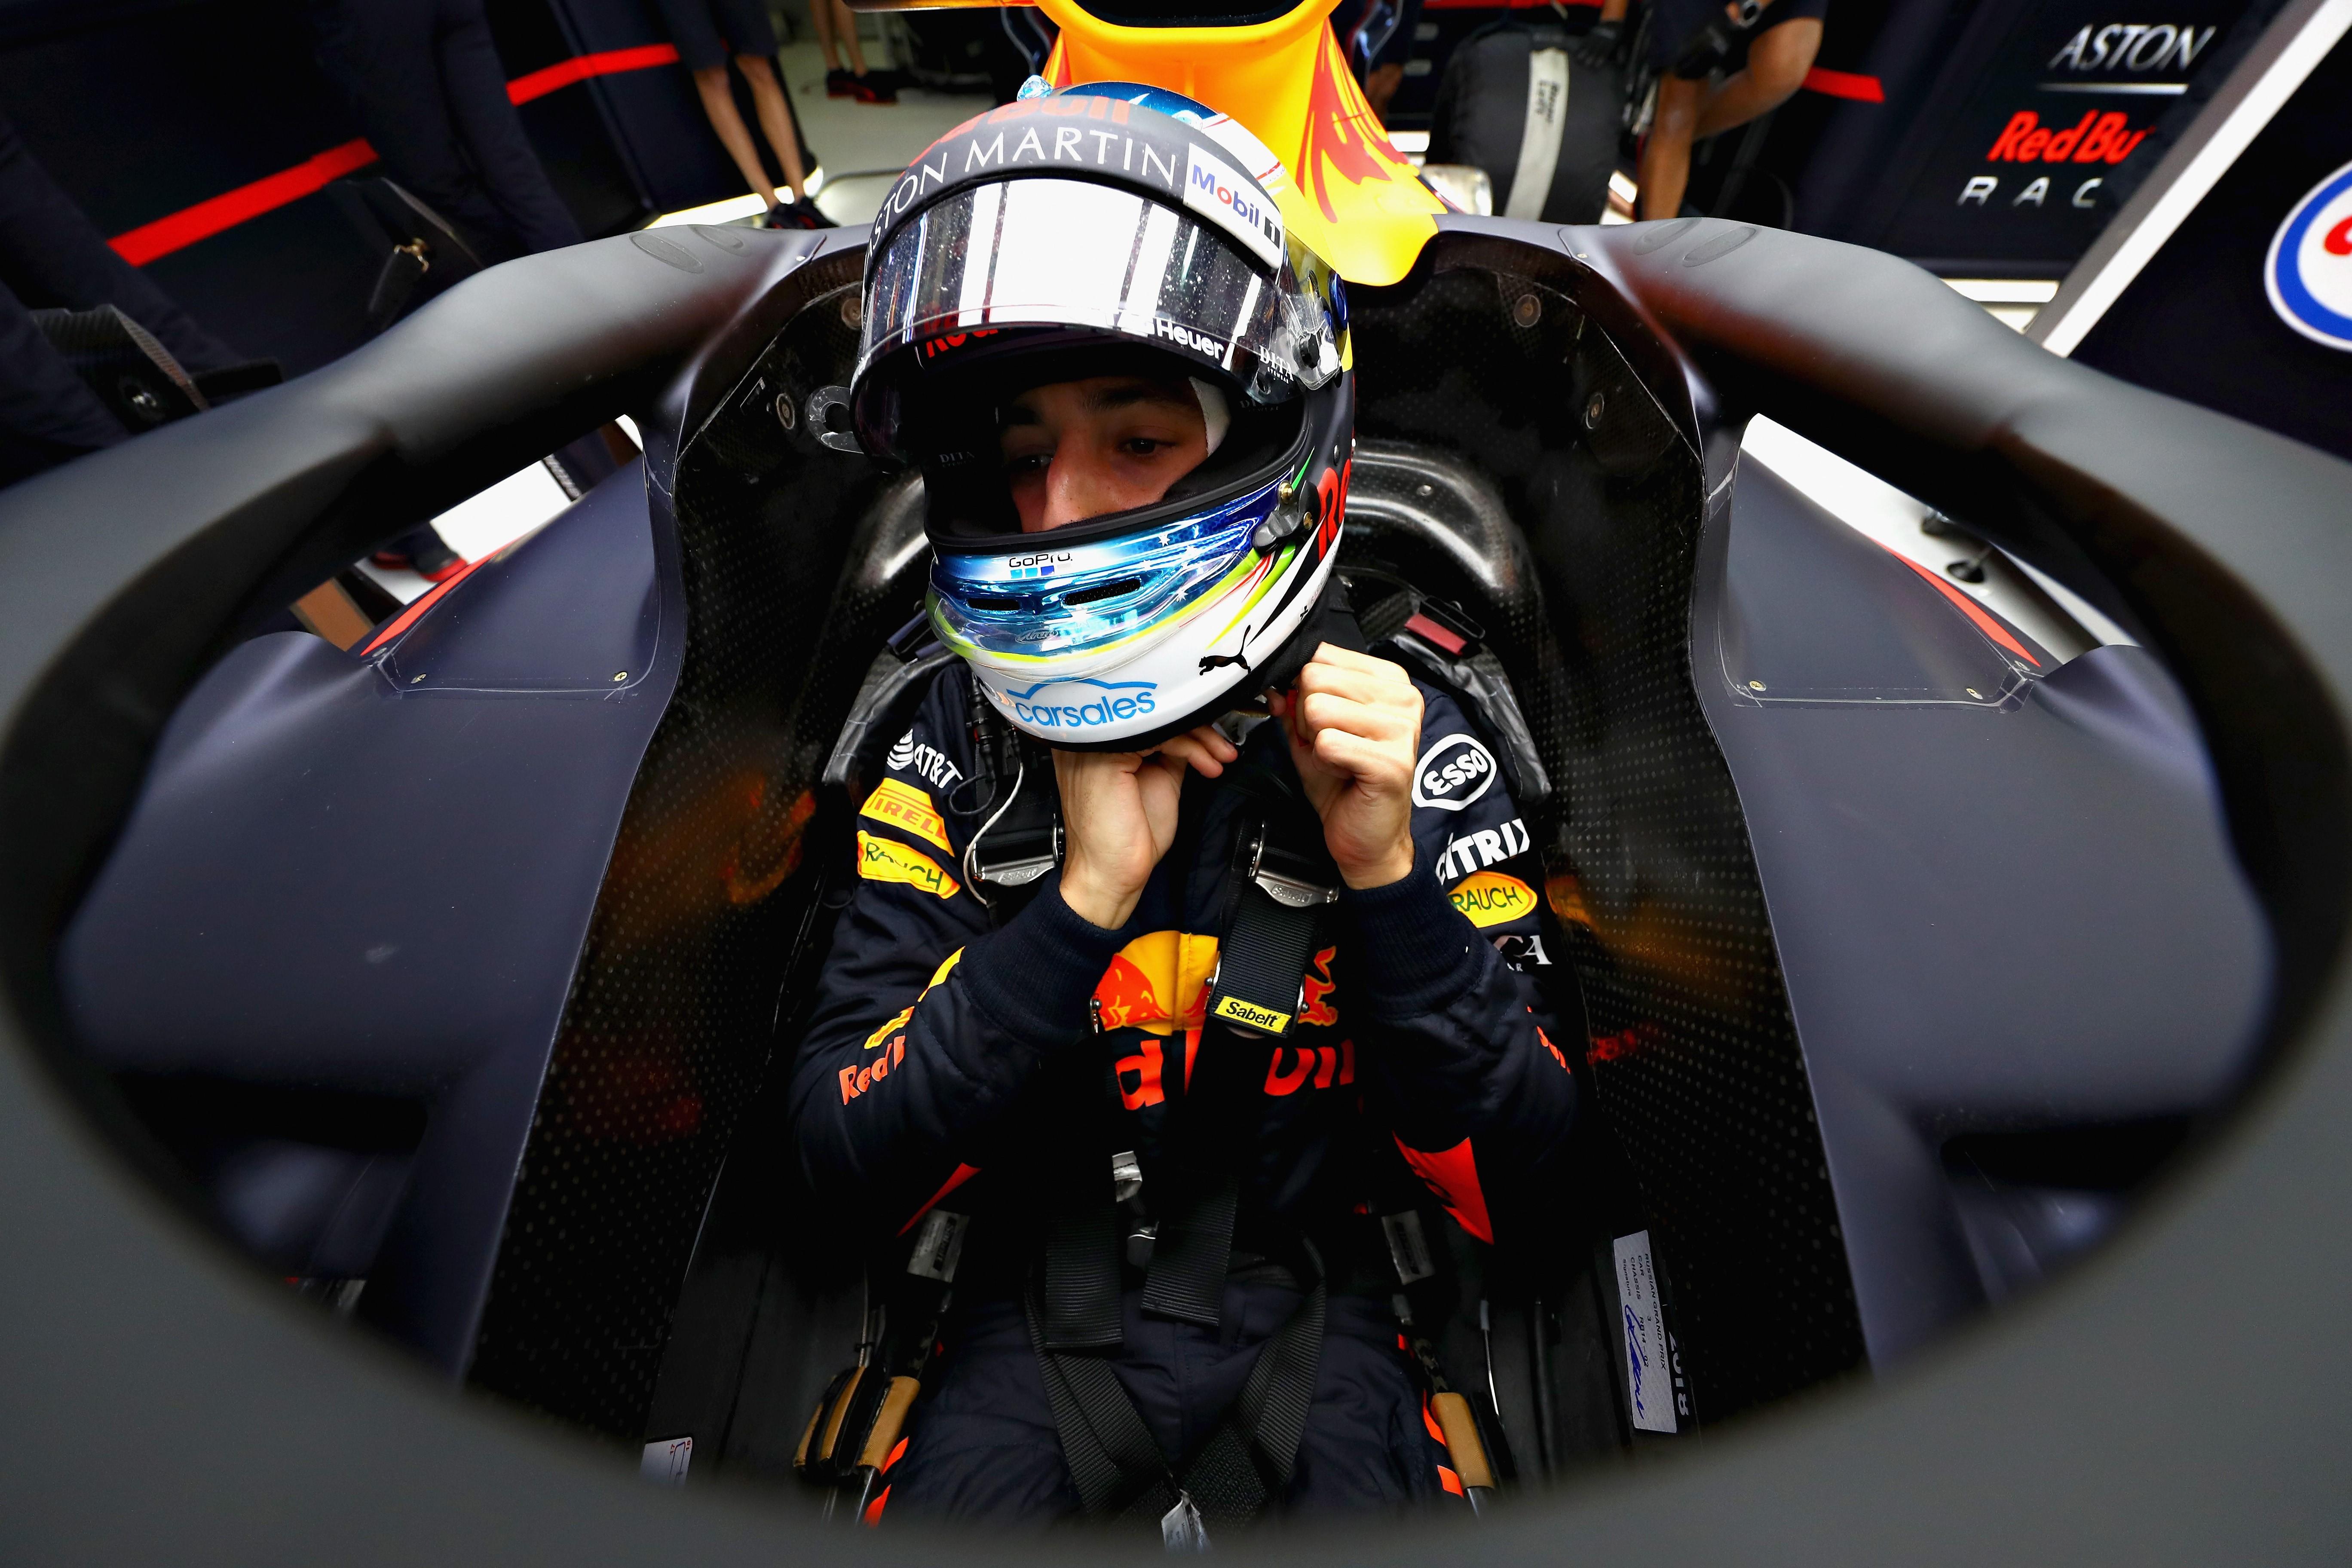 Daniel Ricciardo (Red Bull) au Grand Prix de Russie 2018